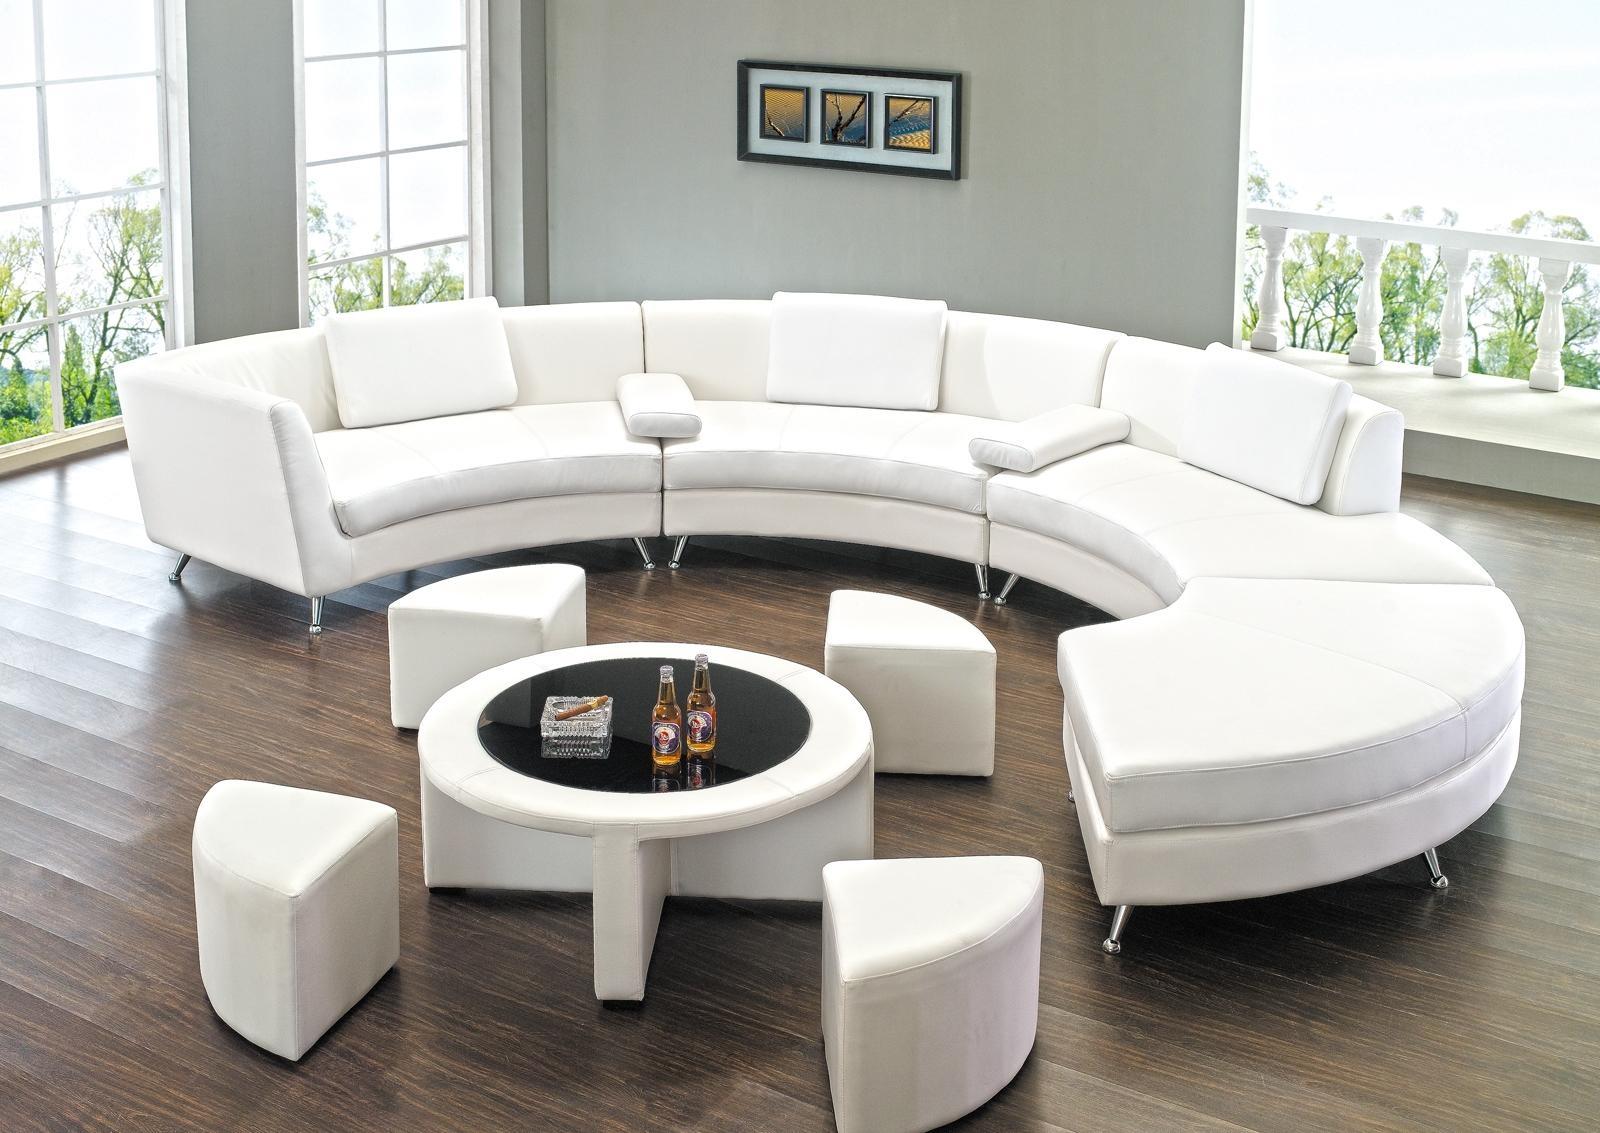 Round Sectional Sofa | Winda 7 Furniture Inside Rounded Sofa (Image 13 of 20)